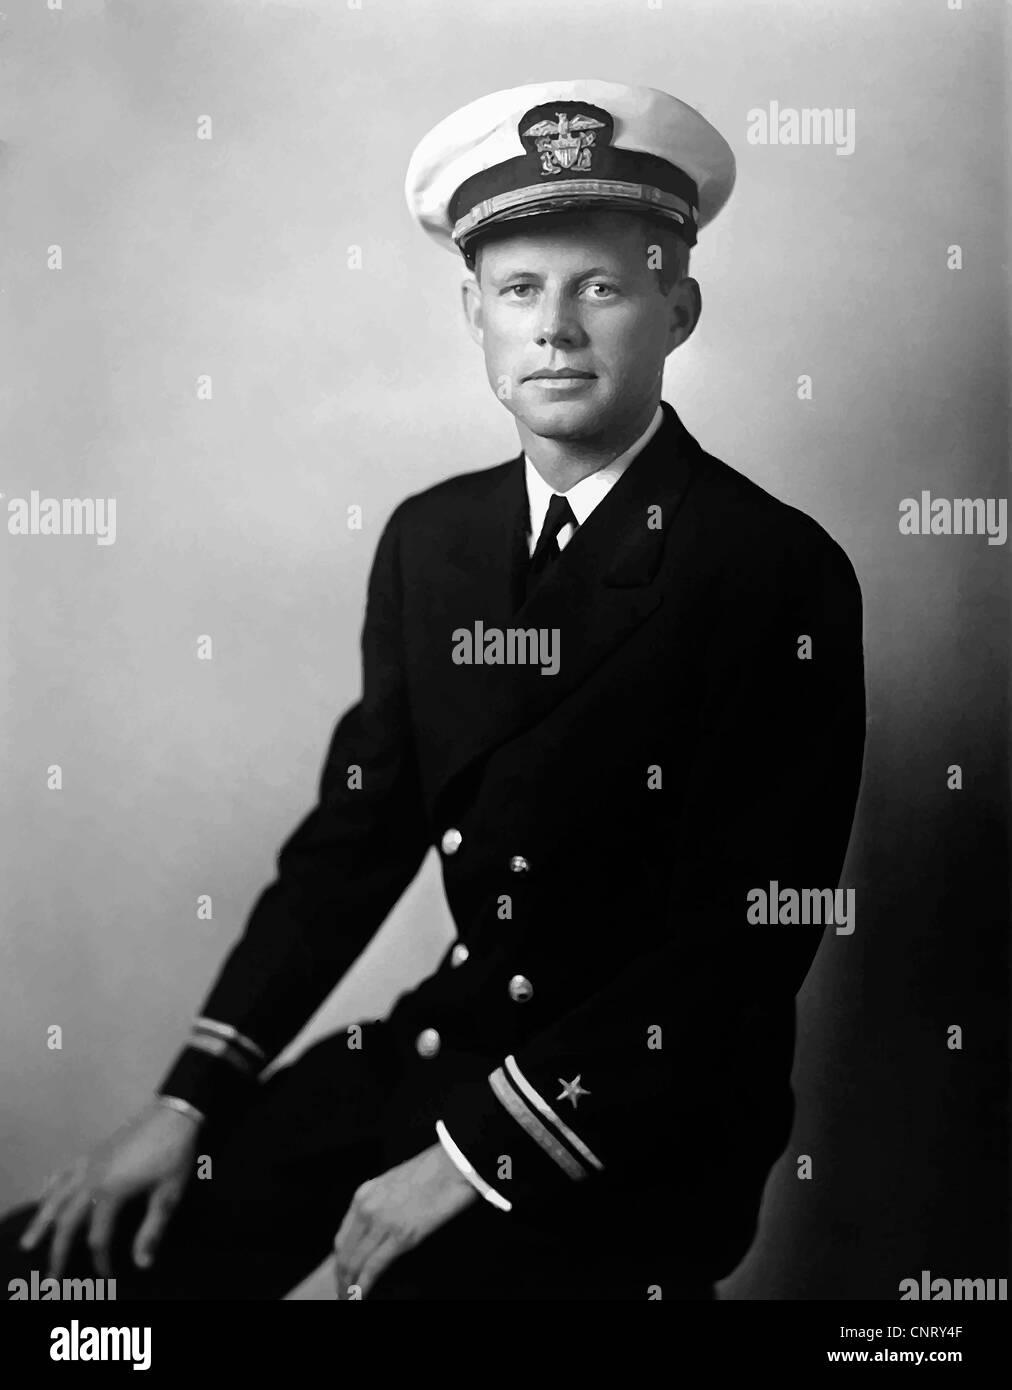 Digitally restored vector portrait of John F. Kennedy dressed in his navy uniform. Circa 1942. - Stock Image